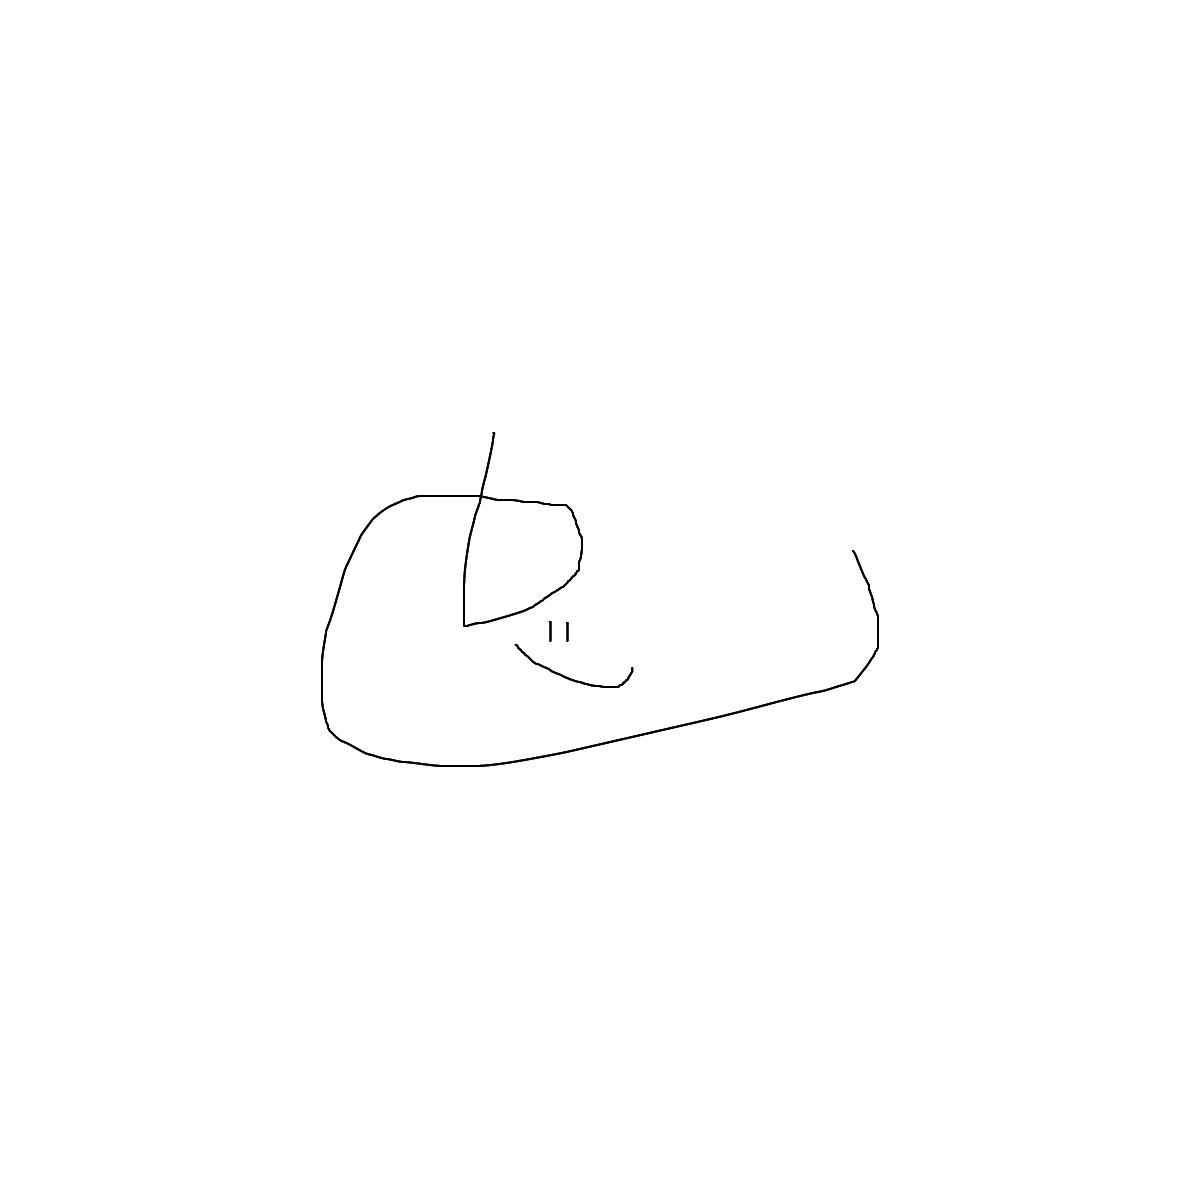 BAAAM drawing#20221 lat:43.3351860046386700lng: -76.1124801635742200